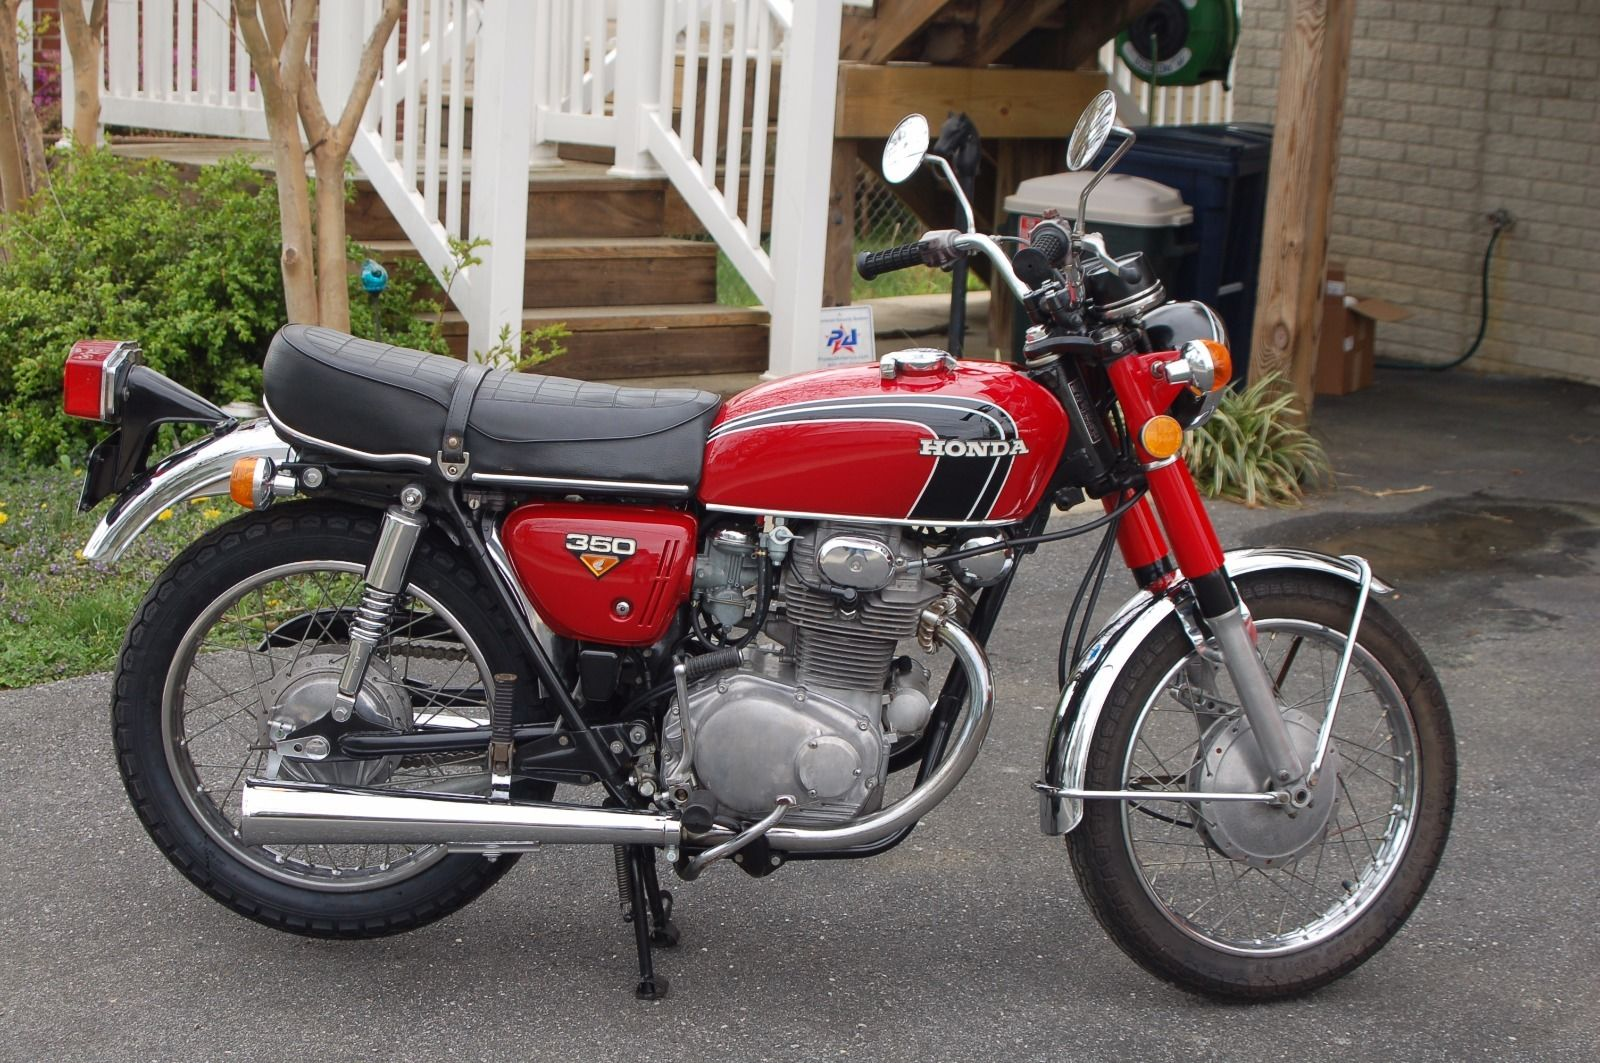 restored honda cb350 1972 photographs at classic bikes. Black Bedroom Furniture Sets. Home Design Ideas